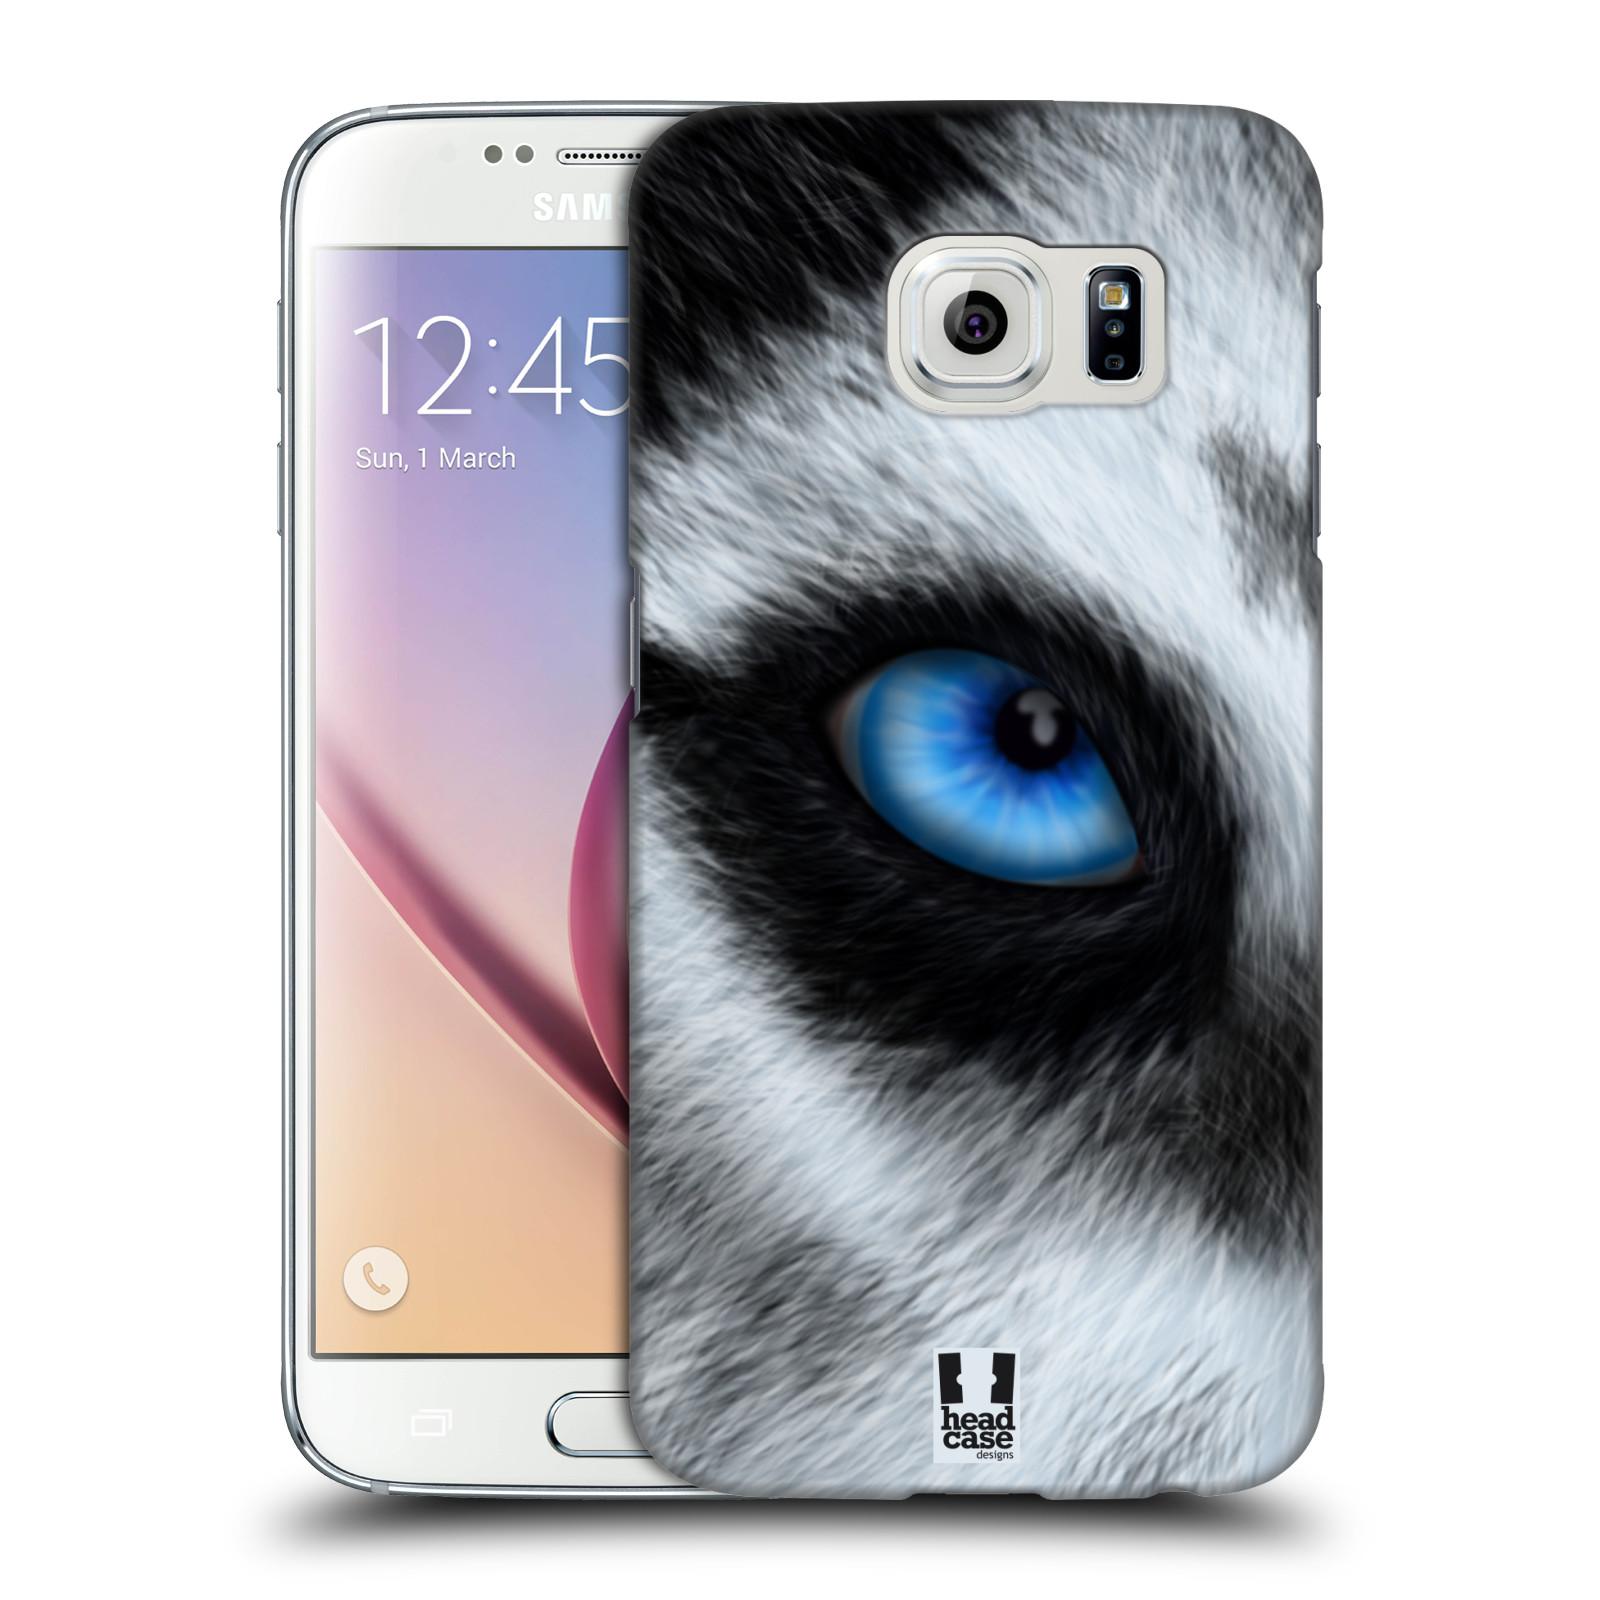 HEAD CASE plastový obal na mobil SAMSUNG Galaxy S6 (G9200, G920F) vzor pohled zvířete oko pes husky